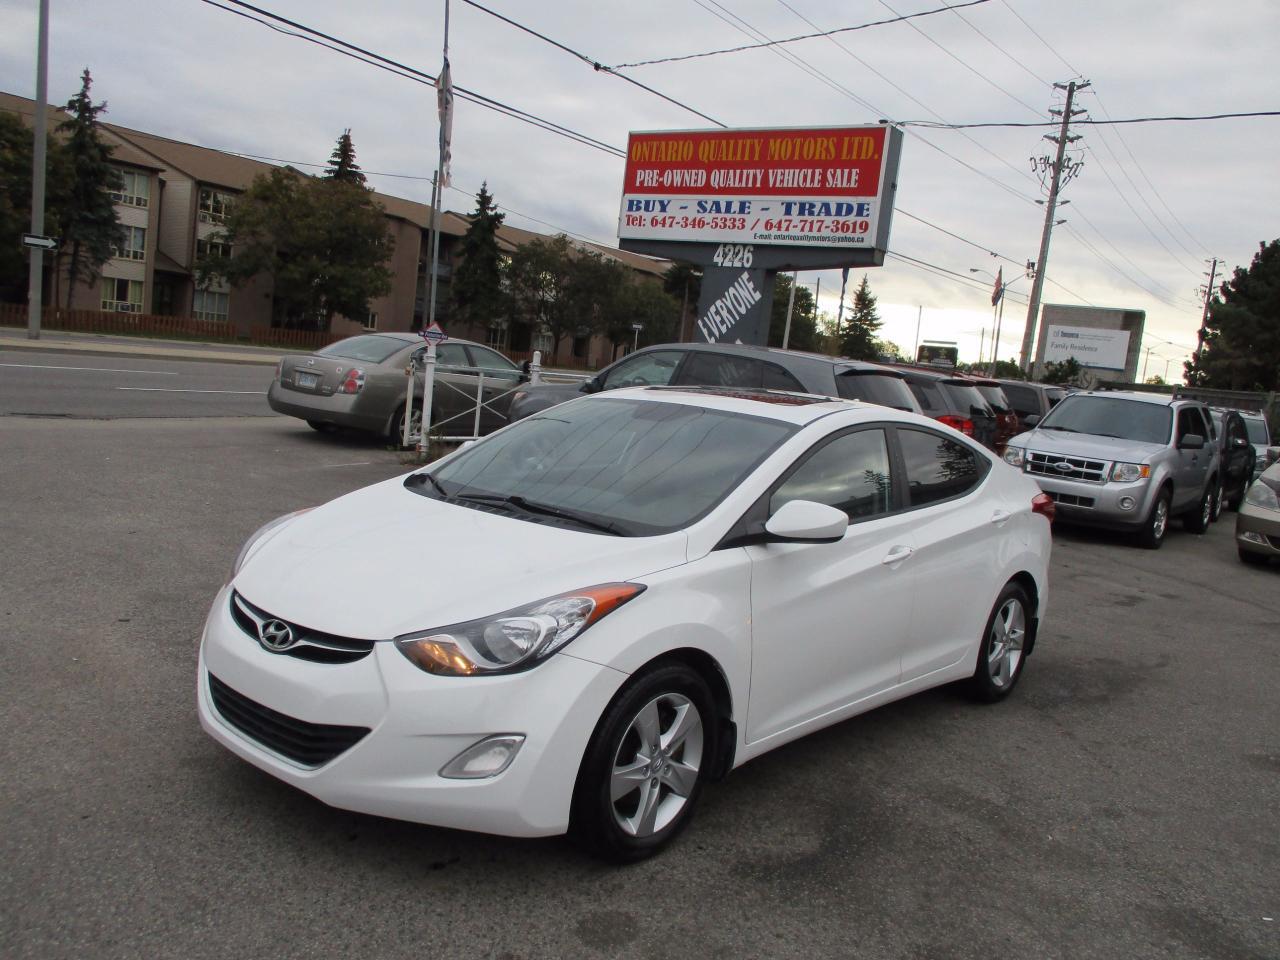 Used Kia Cars For Sale In Toronto